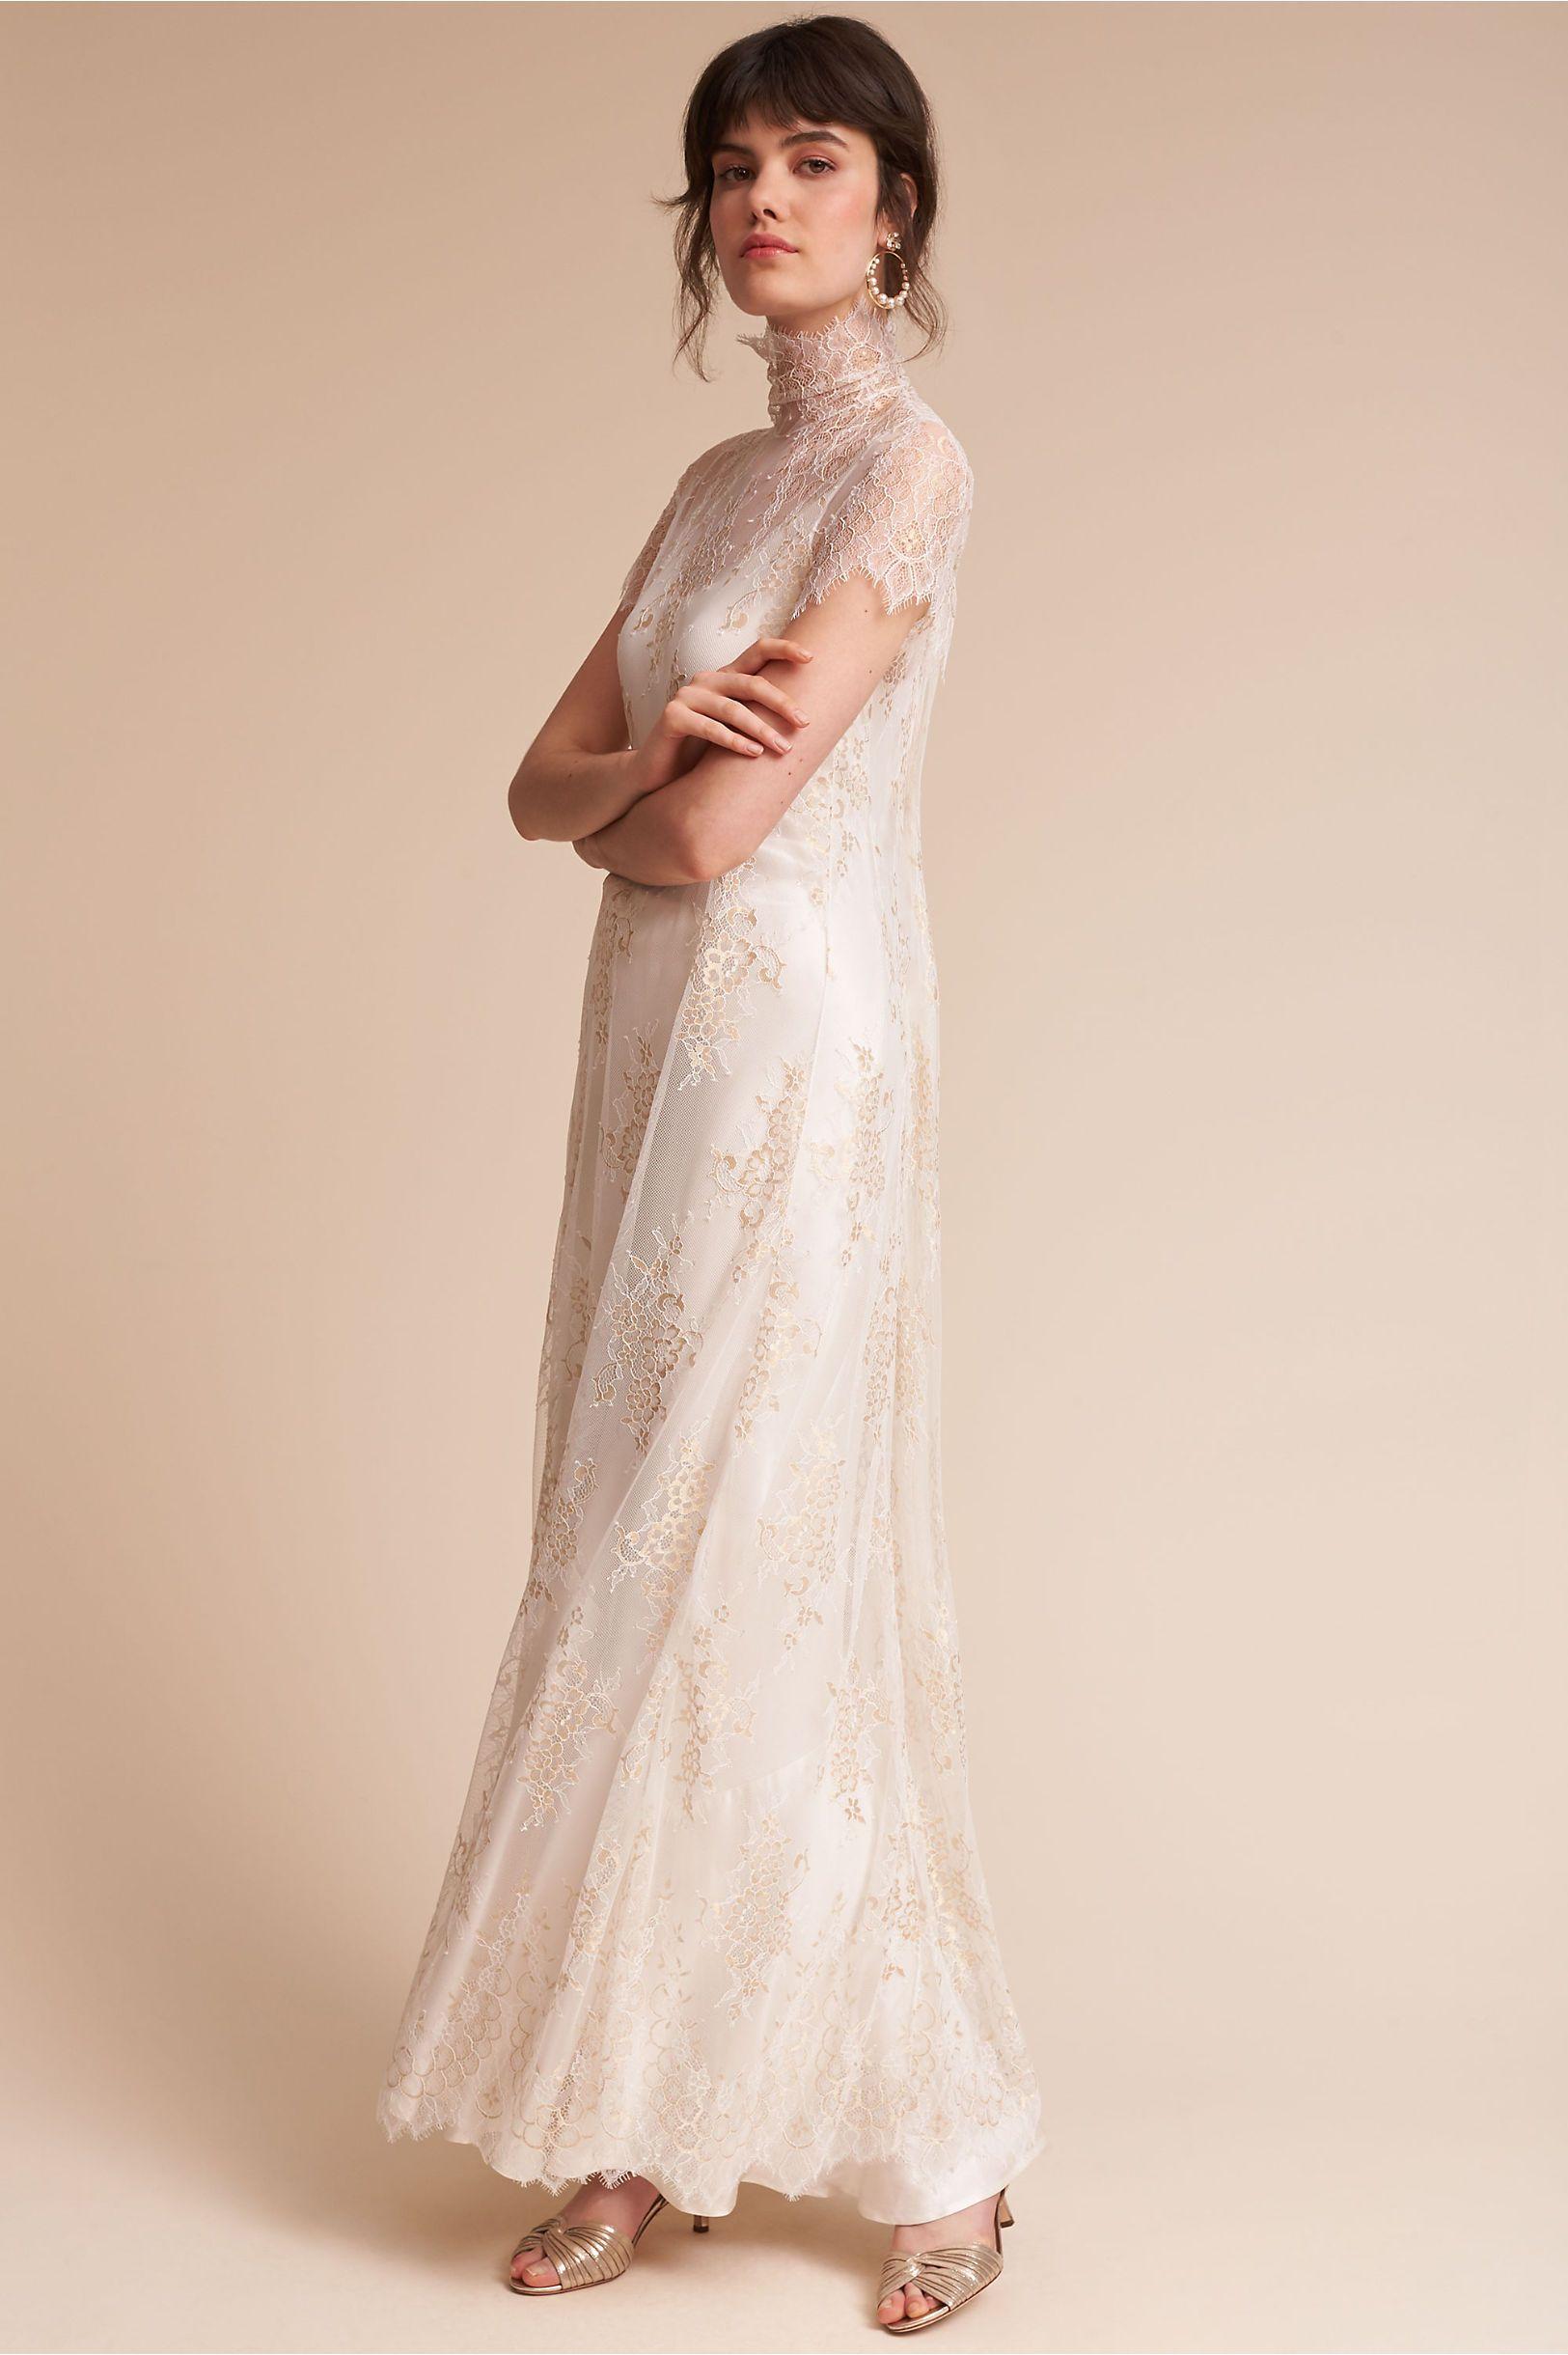 Bella dress brides wedding and veils